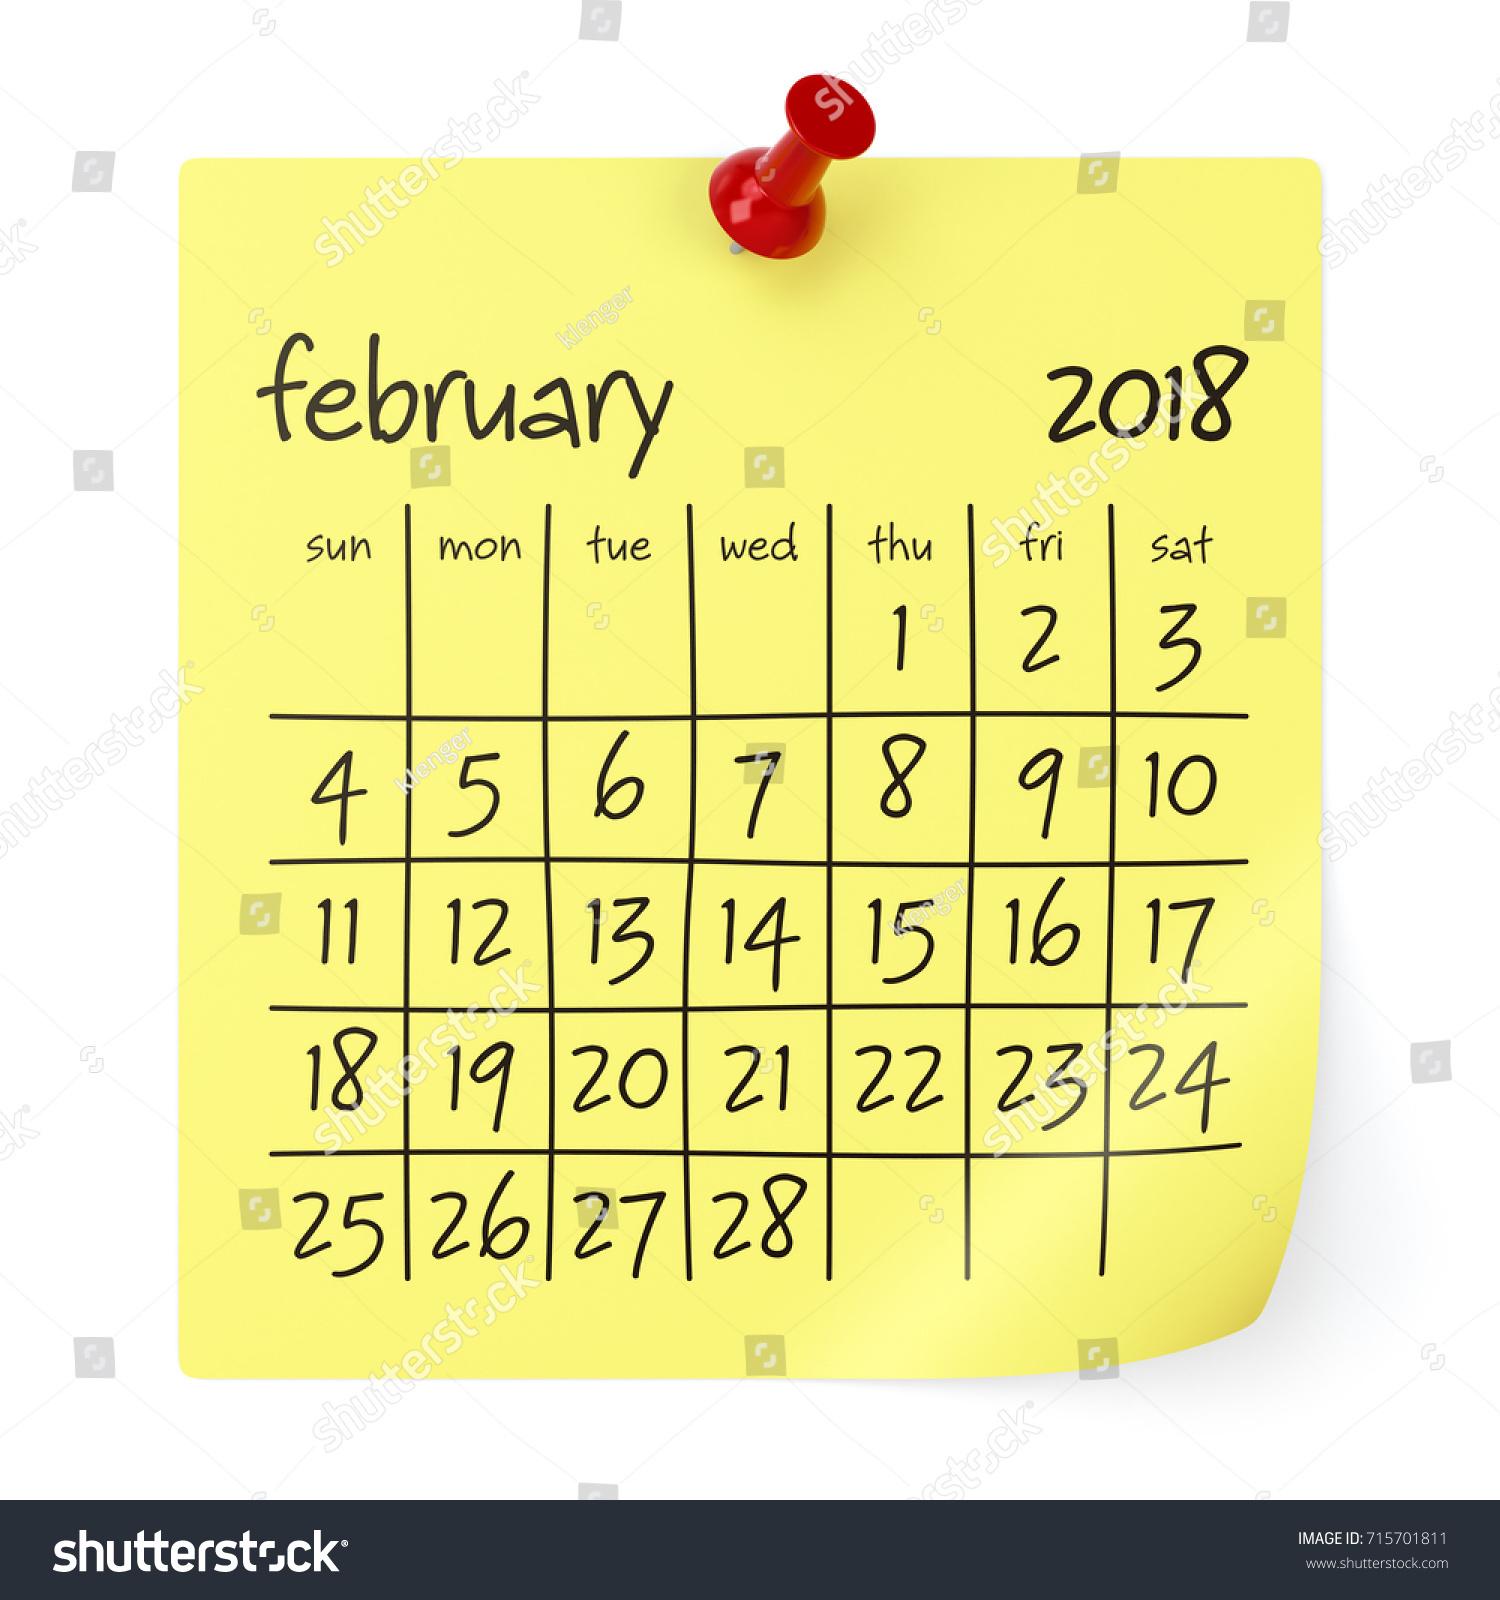 February 2018 Calendar Isolated On White Stock Illustration ...